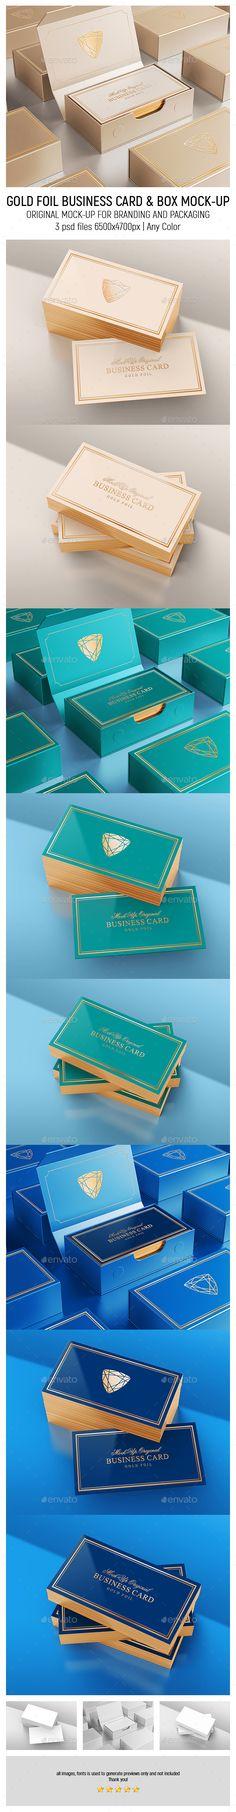 Gold Foil Business Card MockUp — Photoshop PSD #modern #letterpress • Available here → https://graphicriver.net/item/gold-foil-business-card-mockup/18586441?ref=pxcr